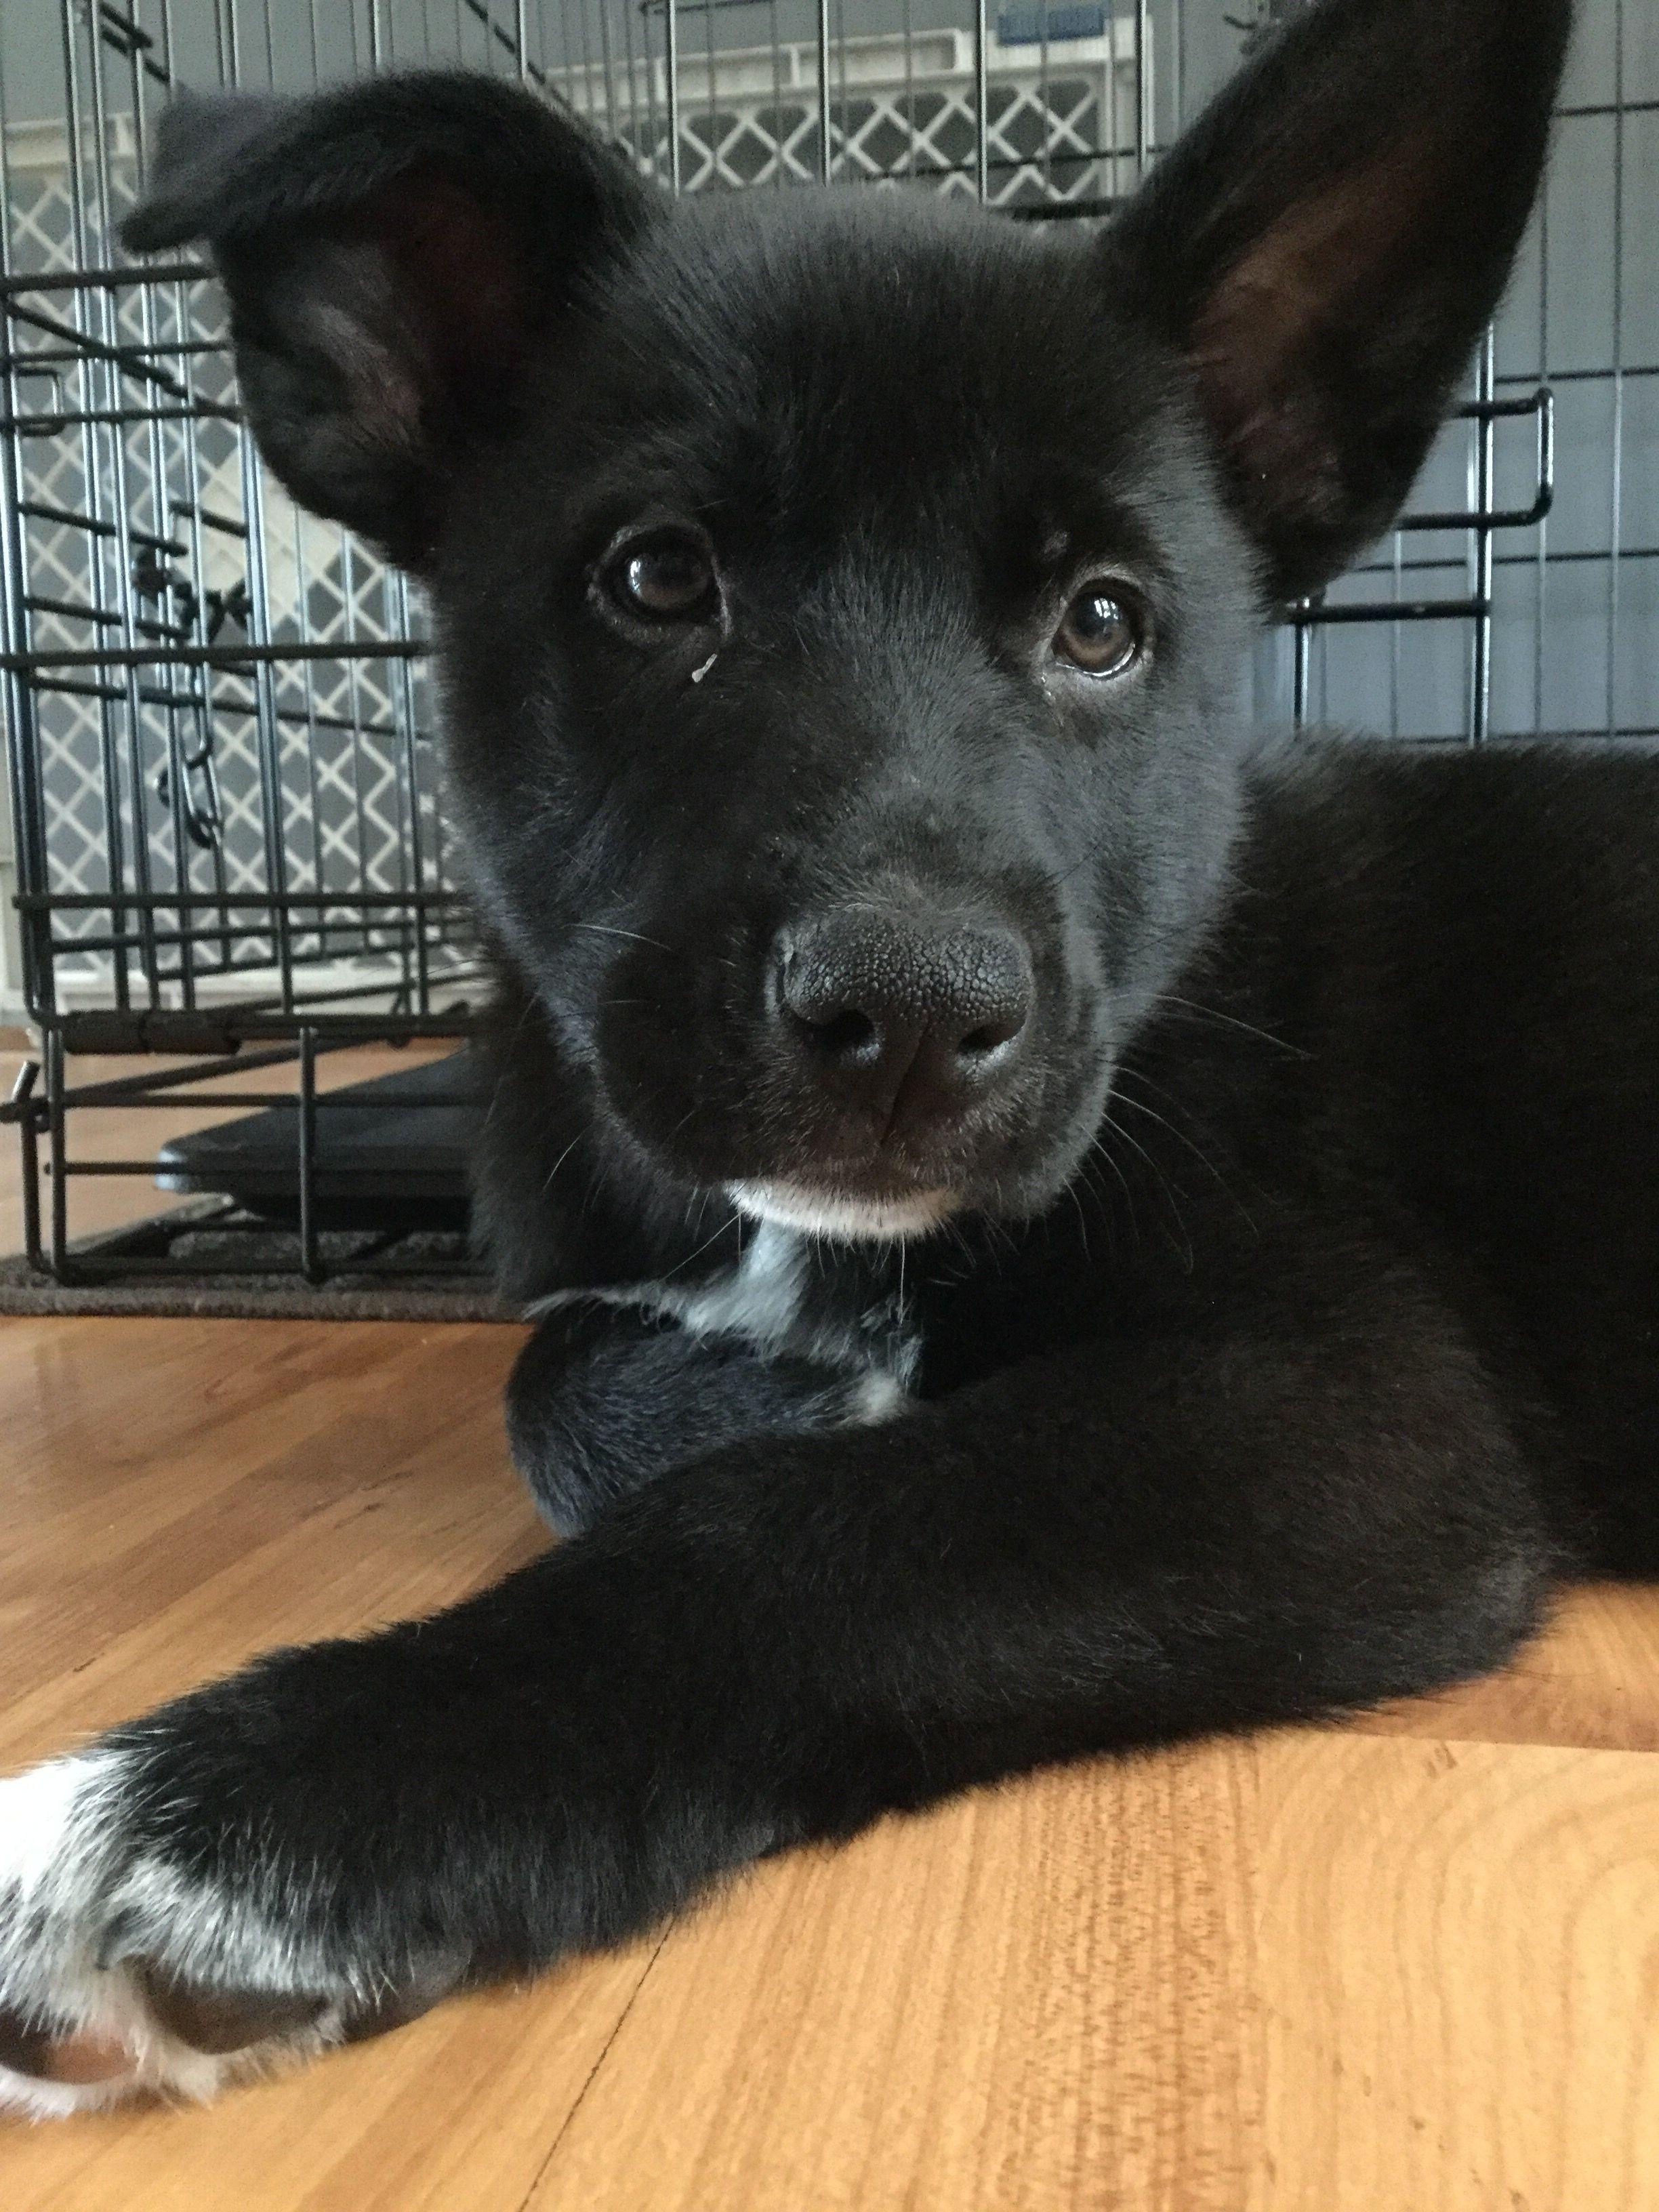 1 2 German Shepherd 1 4 Husky 1 4 Lab My Boy Bear Mixed Breed Dogs Puppy Mix Cute Animals